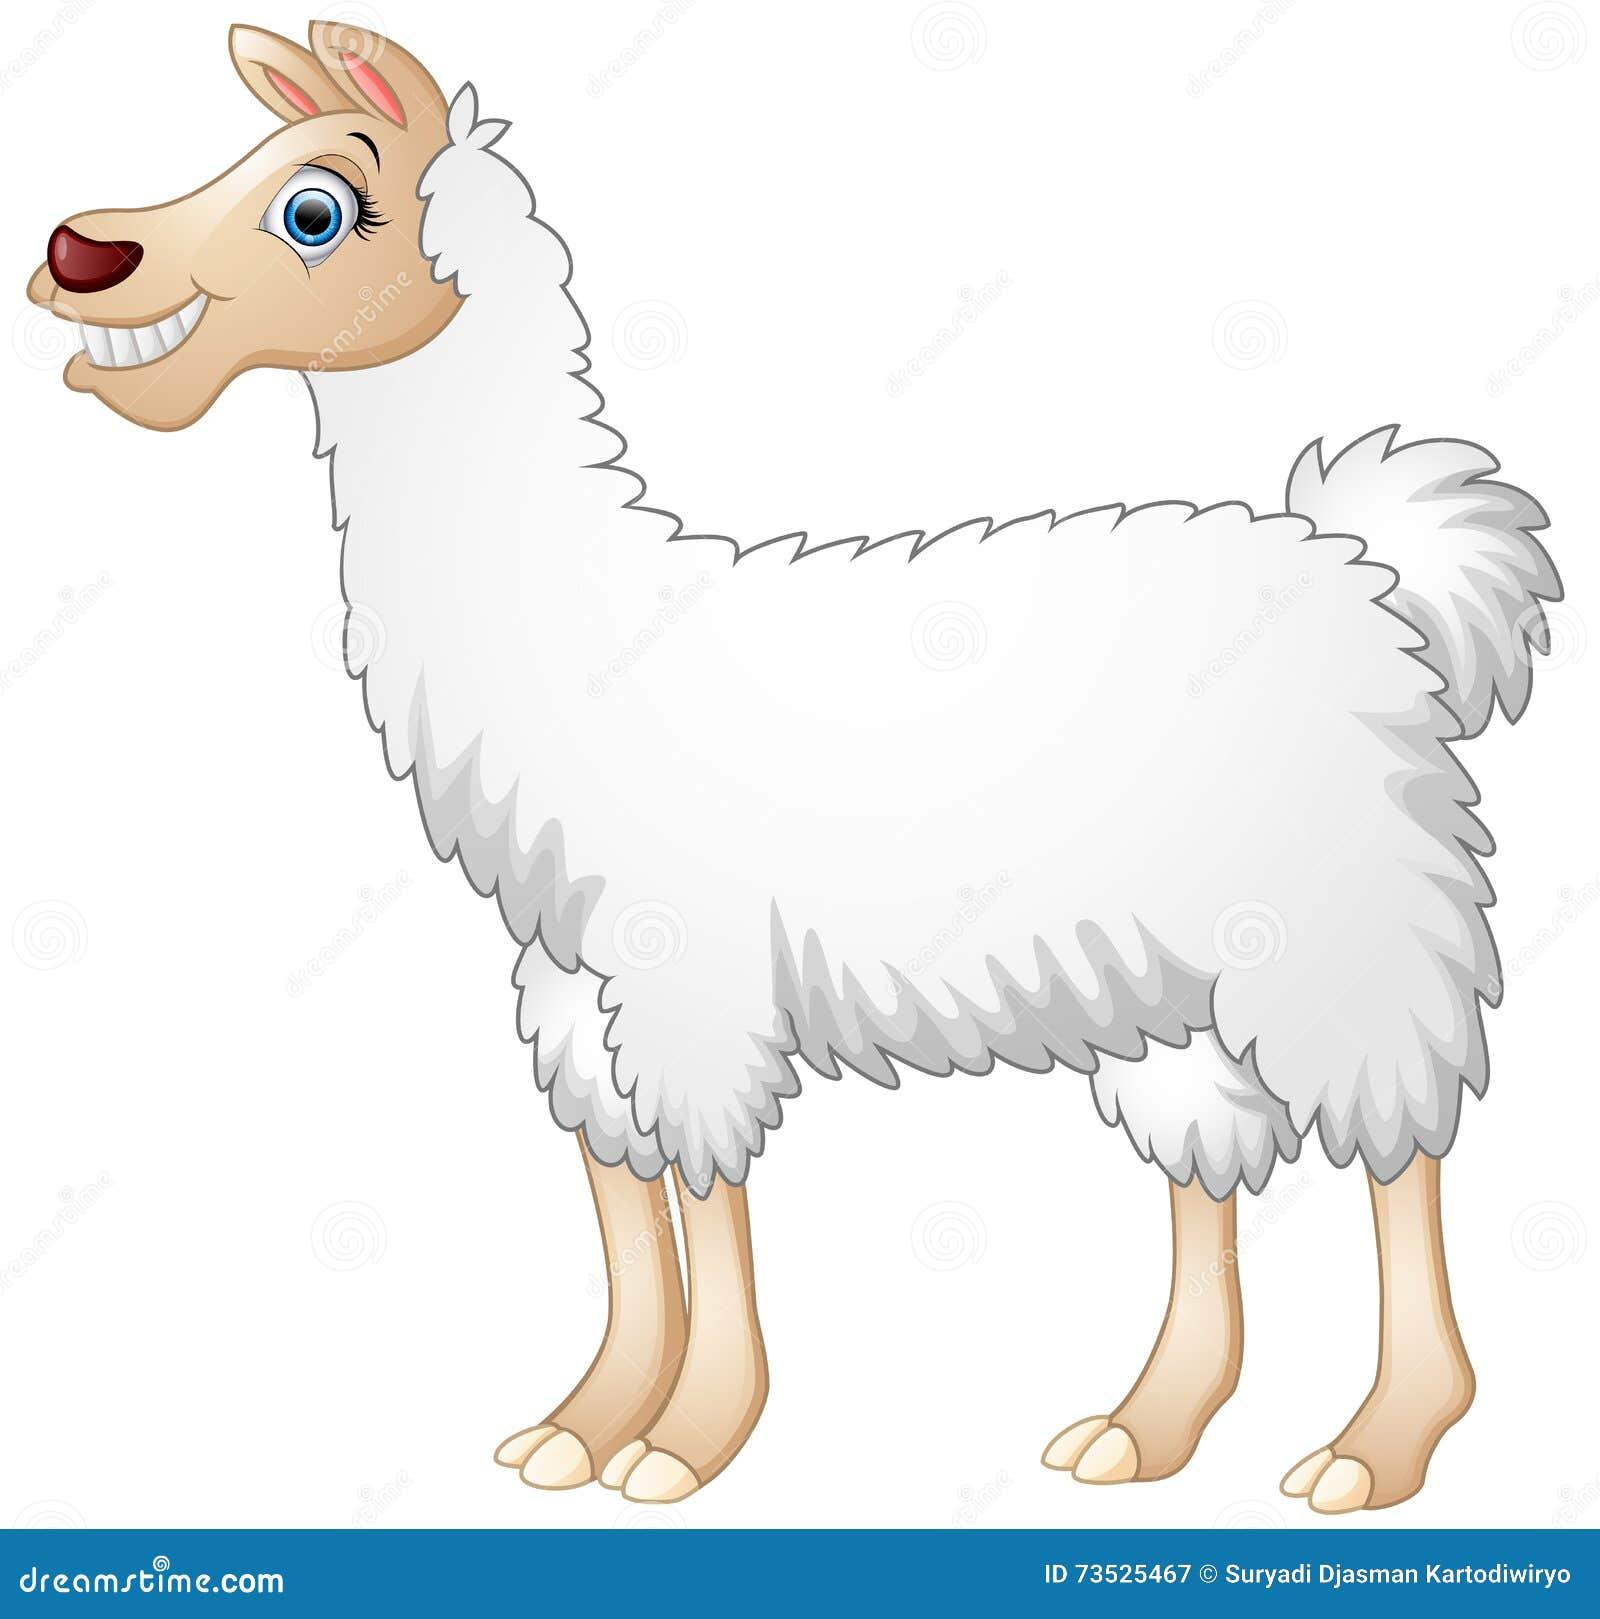 Cute Alpaca Cartoon Stock Vector - Image: 73525467